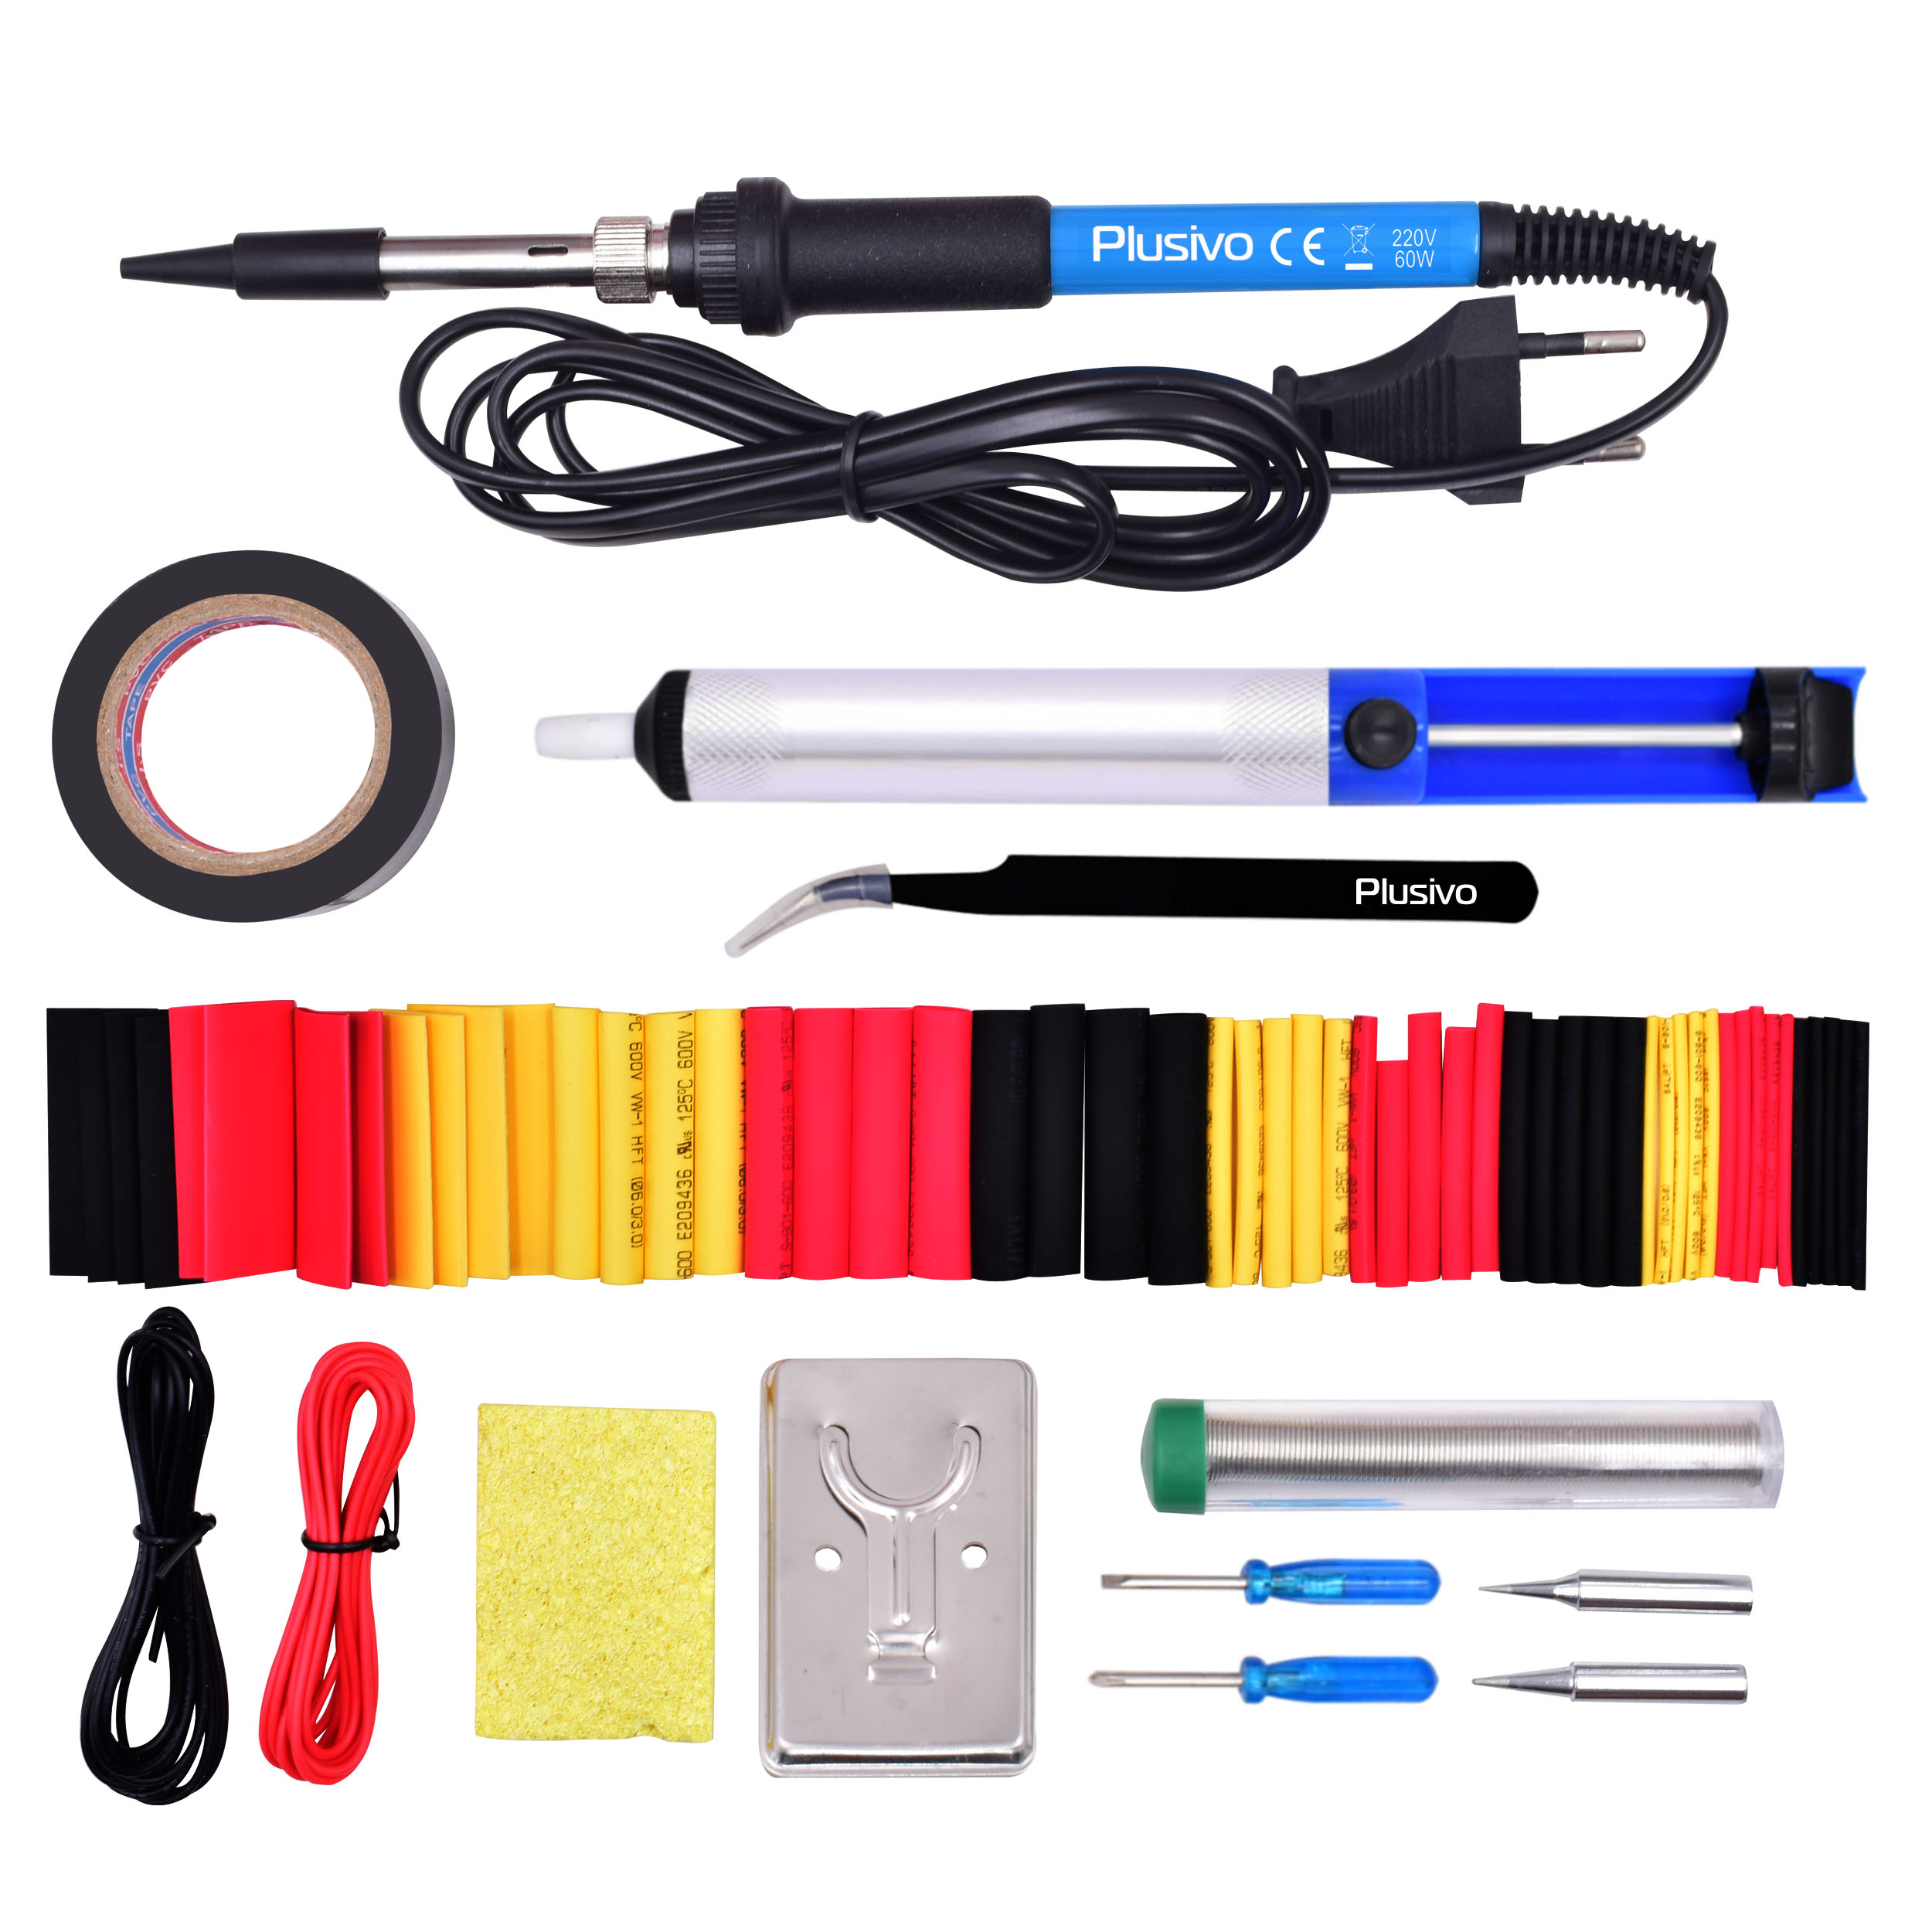 basic-soldering-kit-for-electronics-plug-type-eu_3.jpg